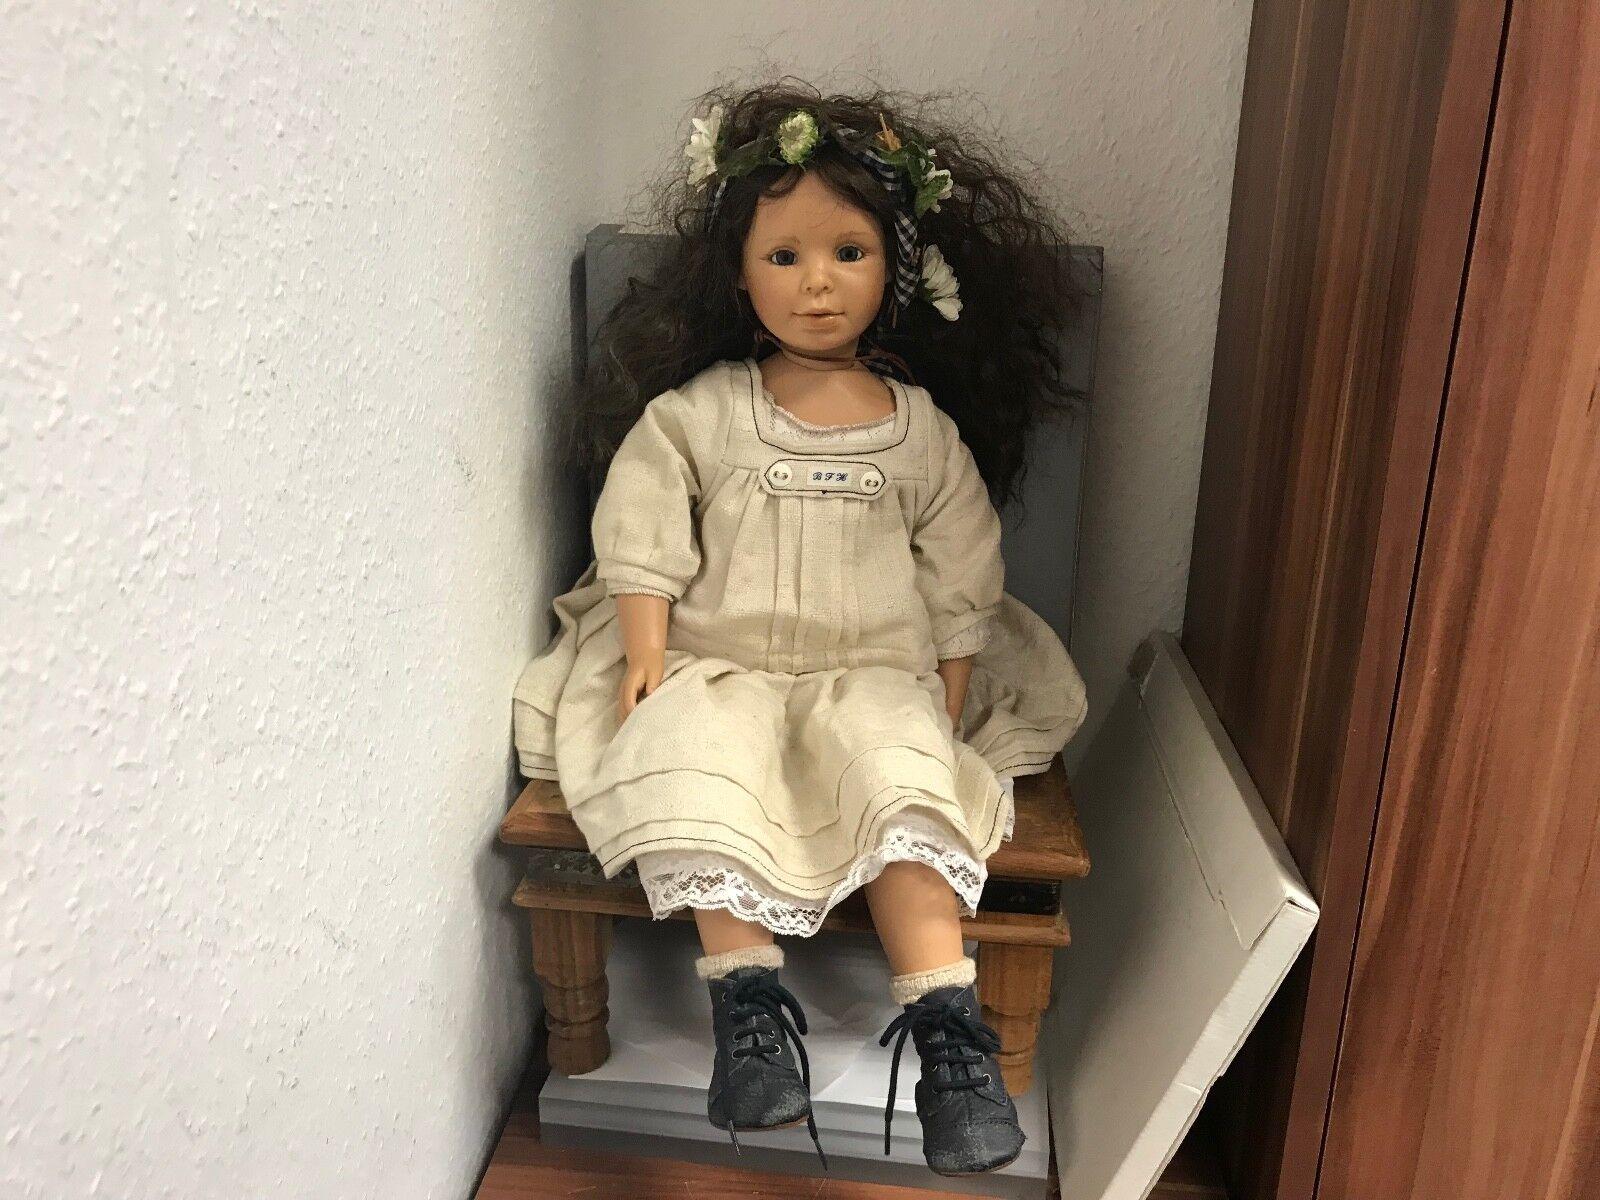 Bettina feigenspan Hirsch muñeca de vinilo 63 cm. top estado.